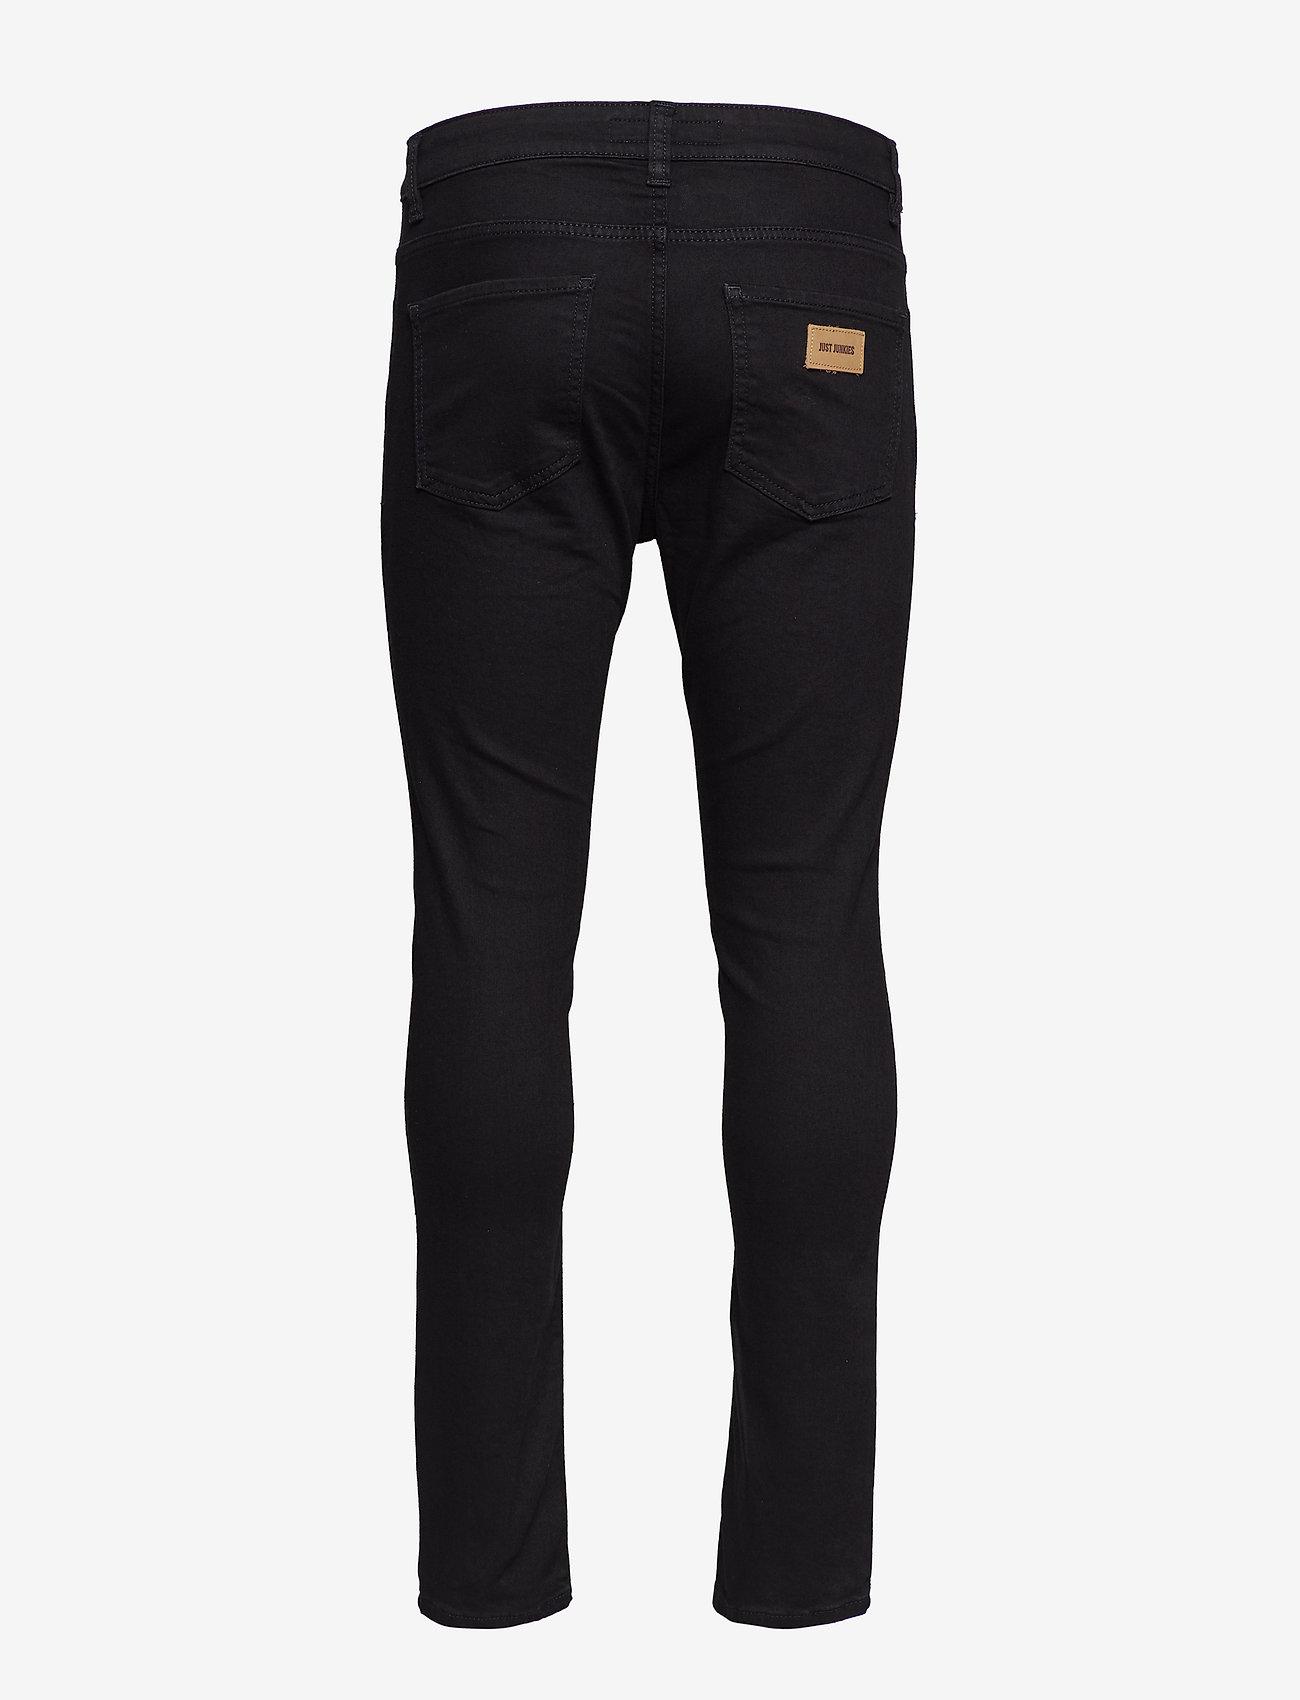 Just Junkies Sicko Black - Jeans